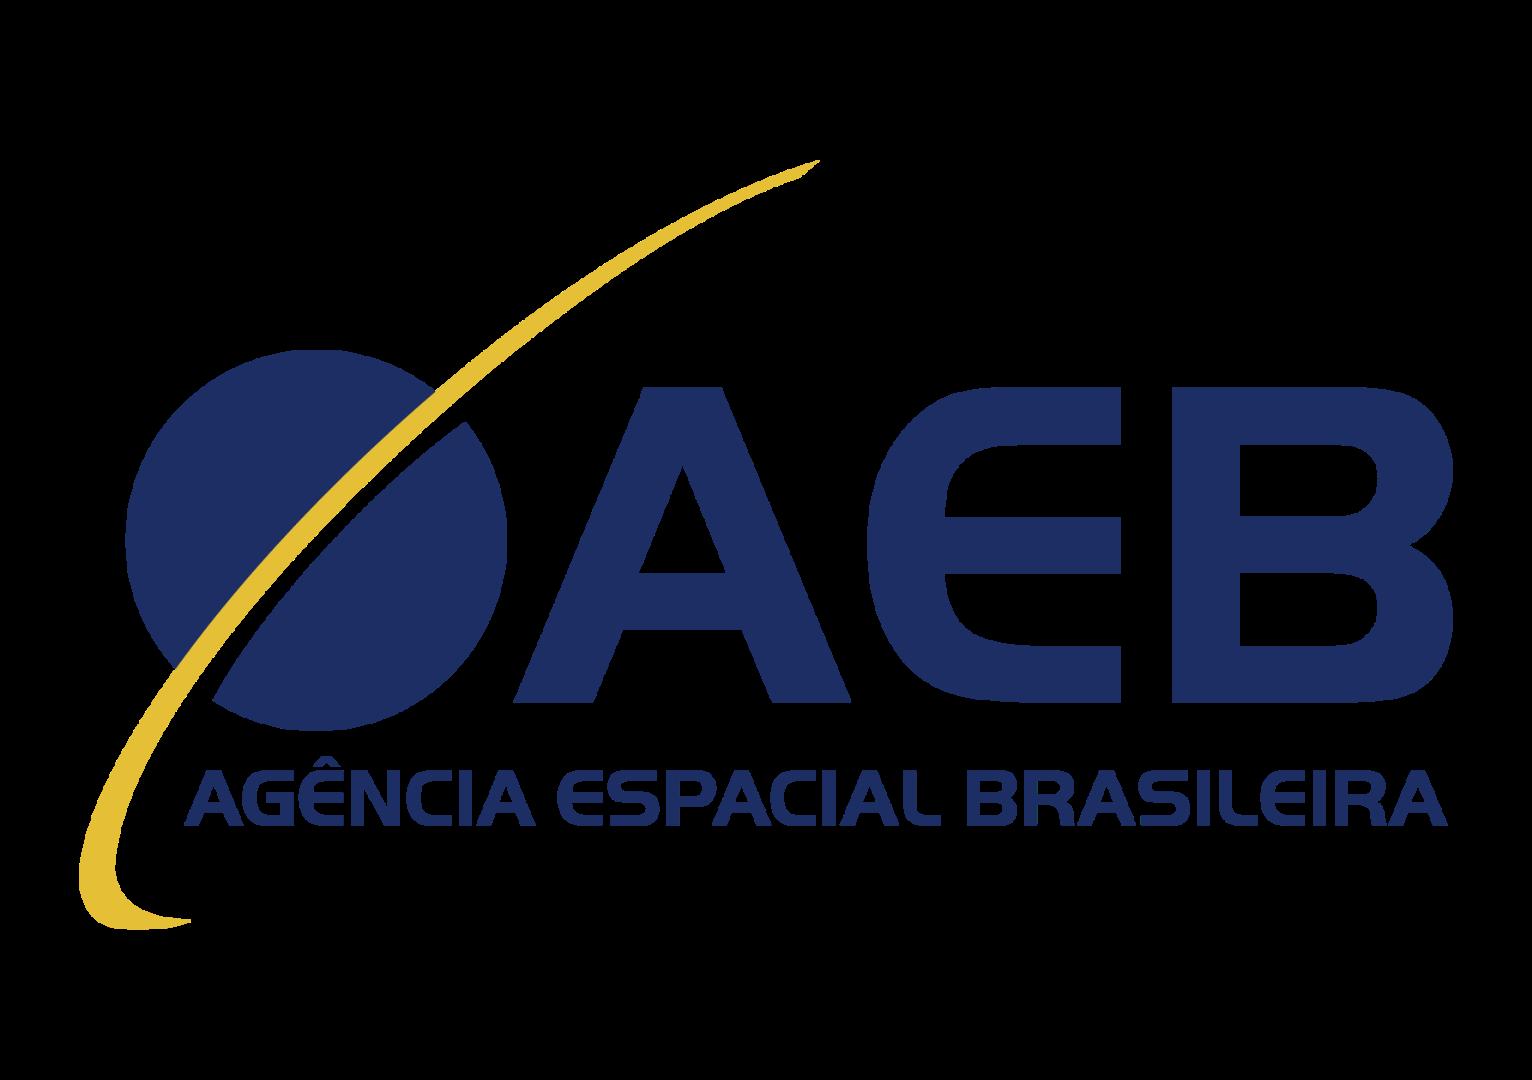 agencia-espacial-brasileira-aeb